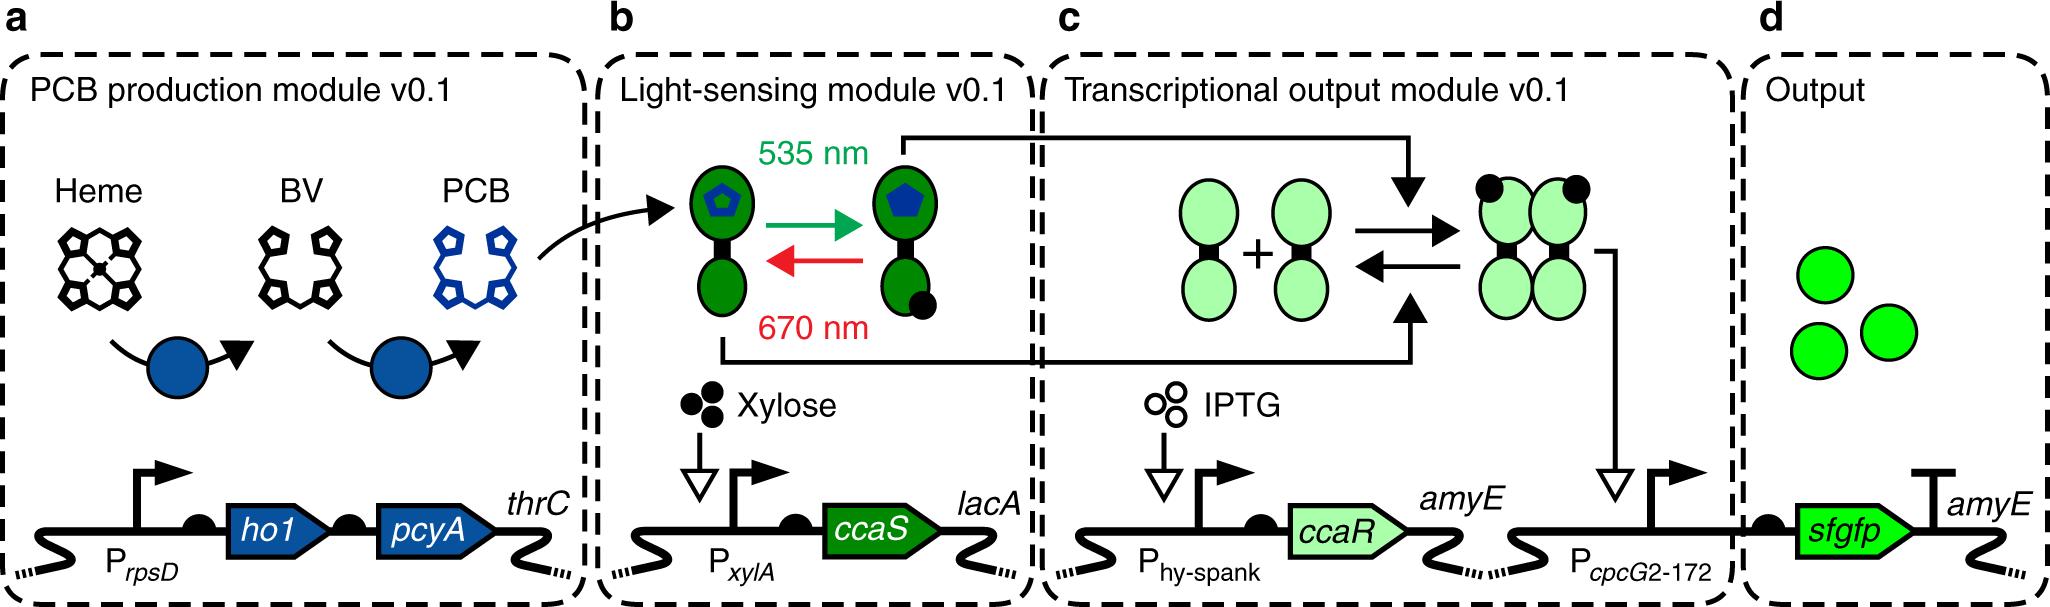 Optogenetic control of Bacillus subtilis gene expression | Nature